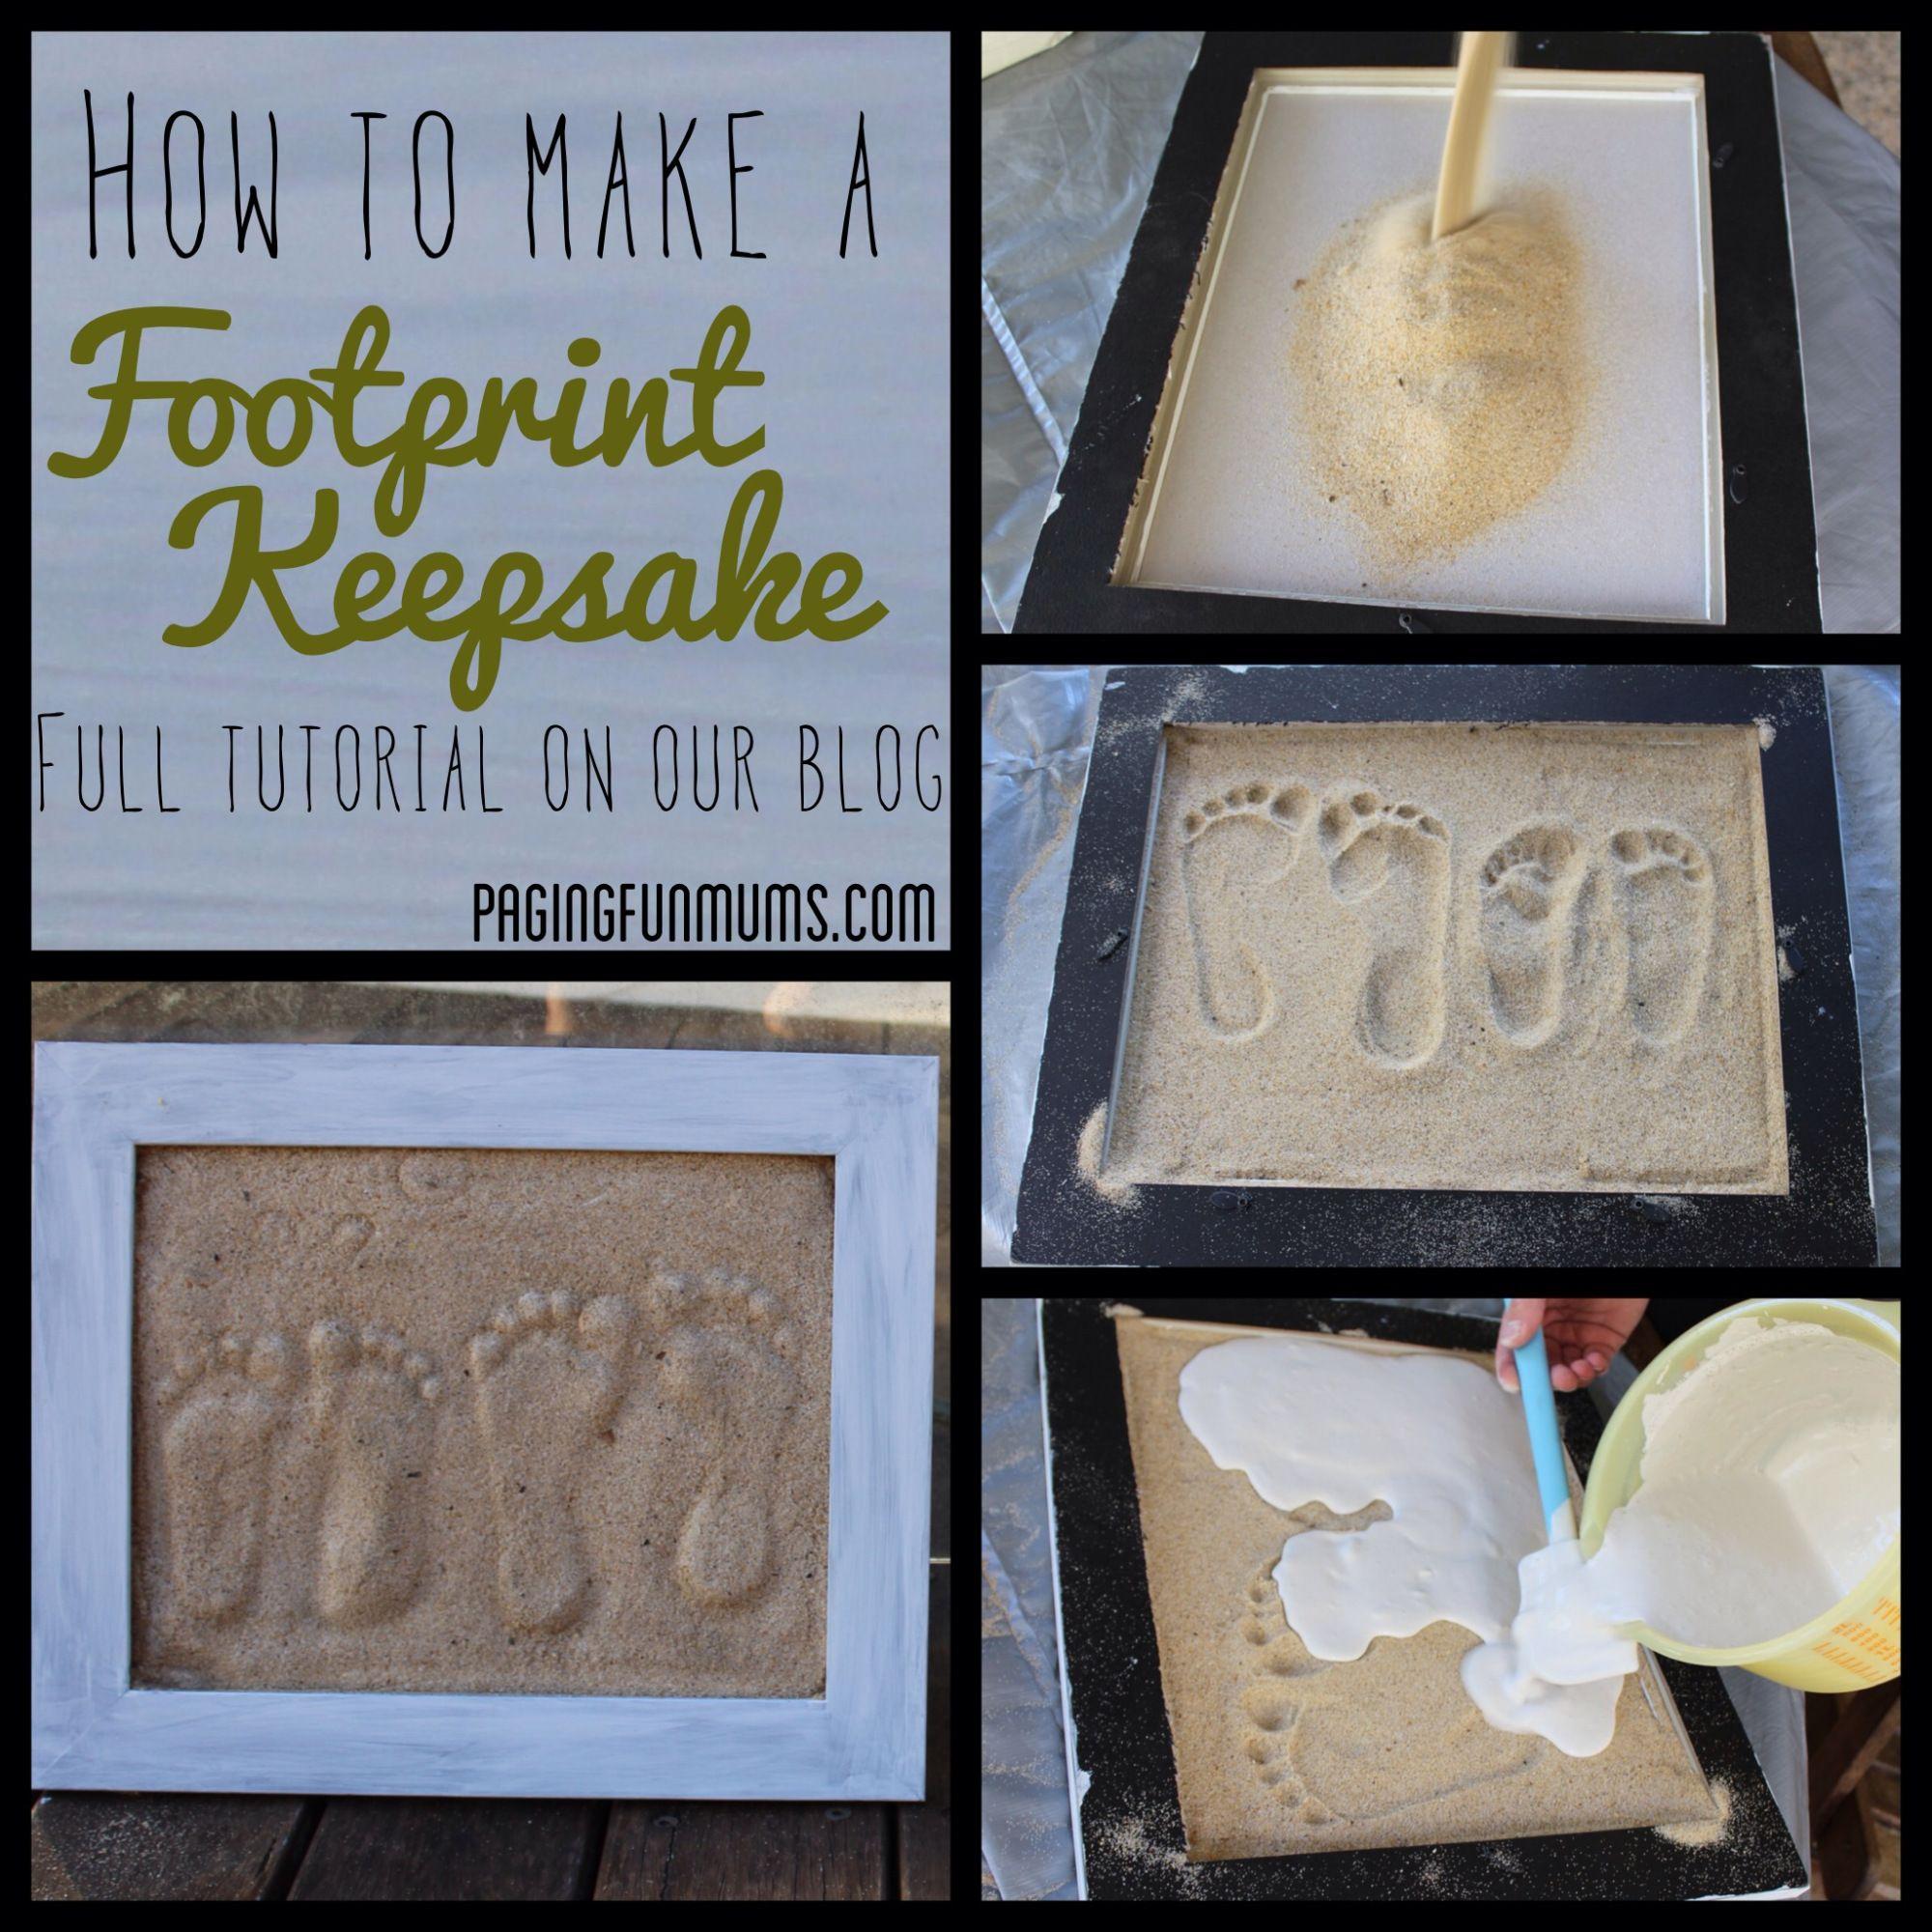 Sand Footprint Craft Full Diy Instructions Crafts Pinterest